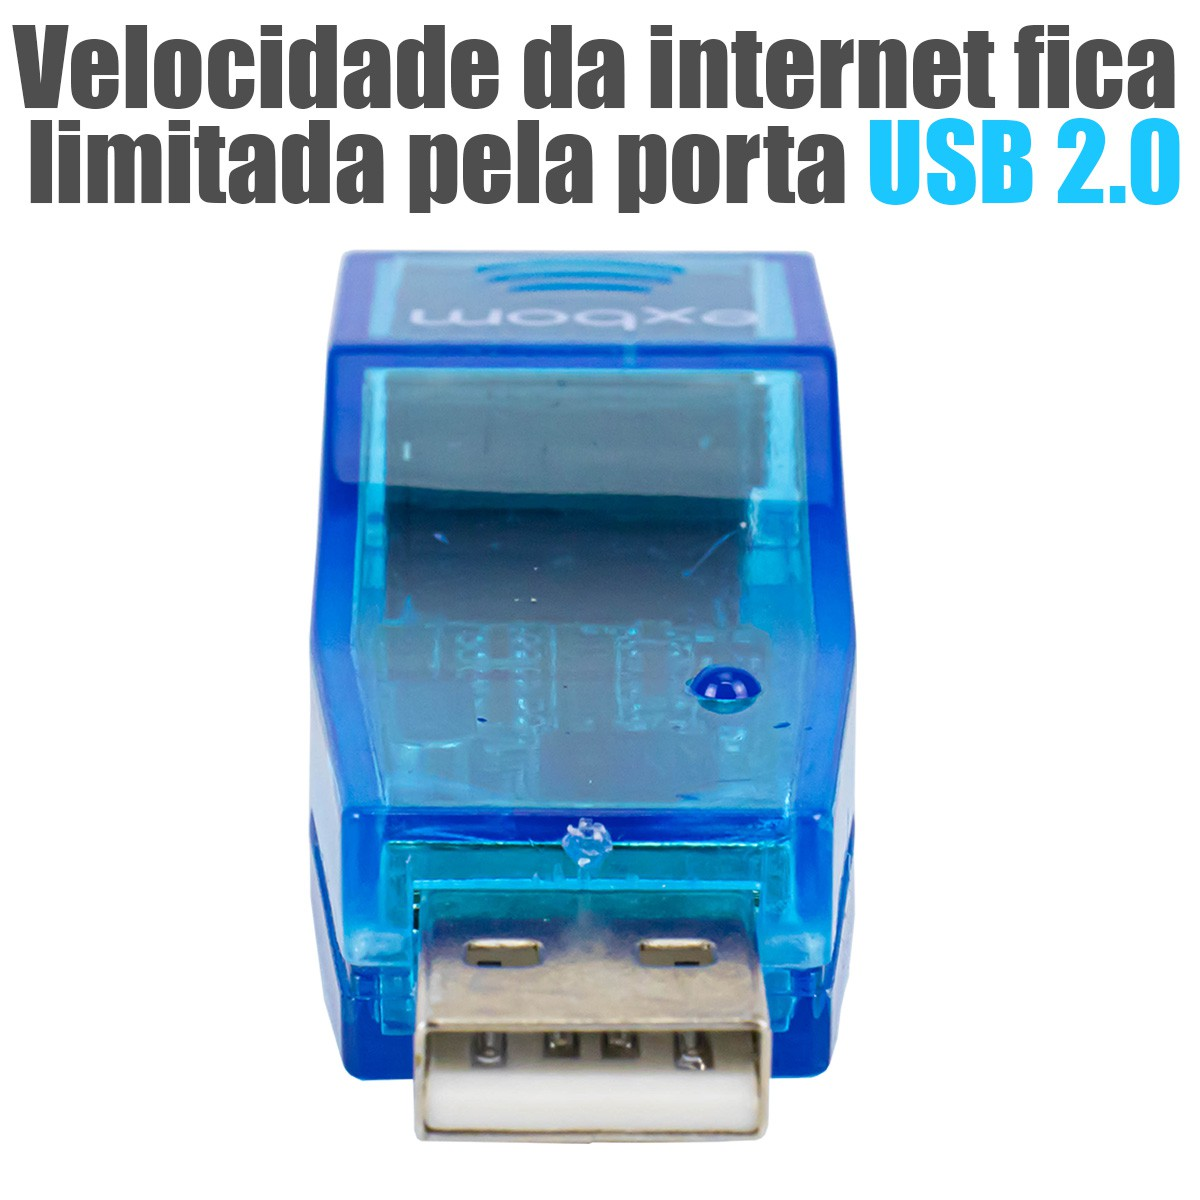 KIT 10 Adaptadores USB 2.0 para Rede Lan RJ45 Exbom UL-100